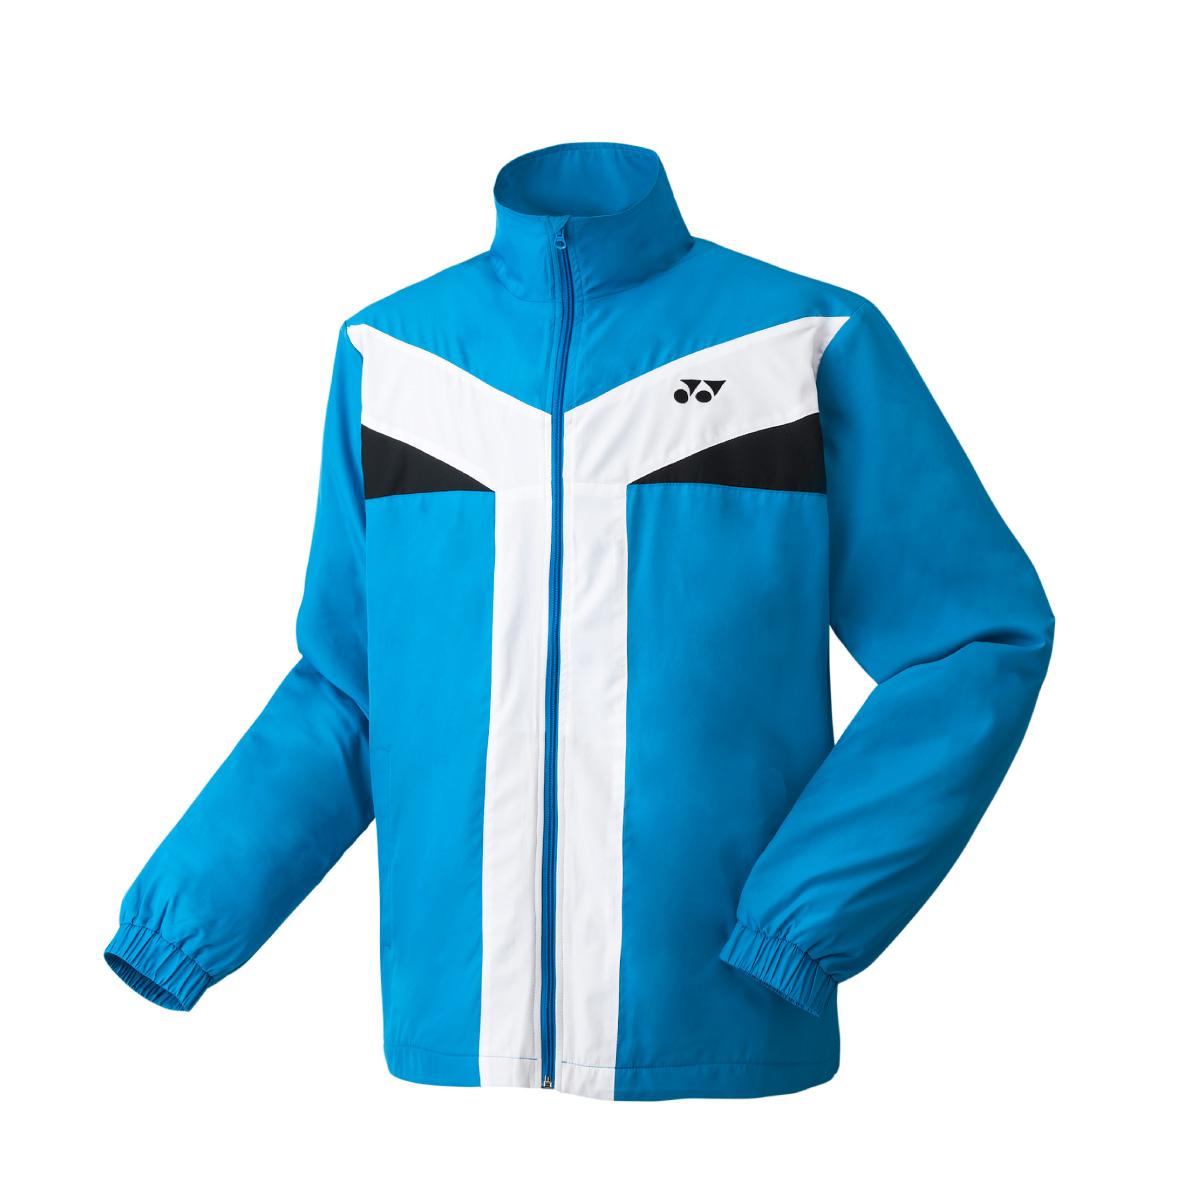 YONEX - Men's Warm-up Jacket, Club Team #YM0020Detailbild - 1